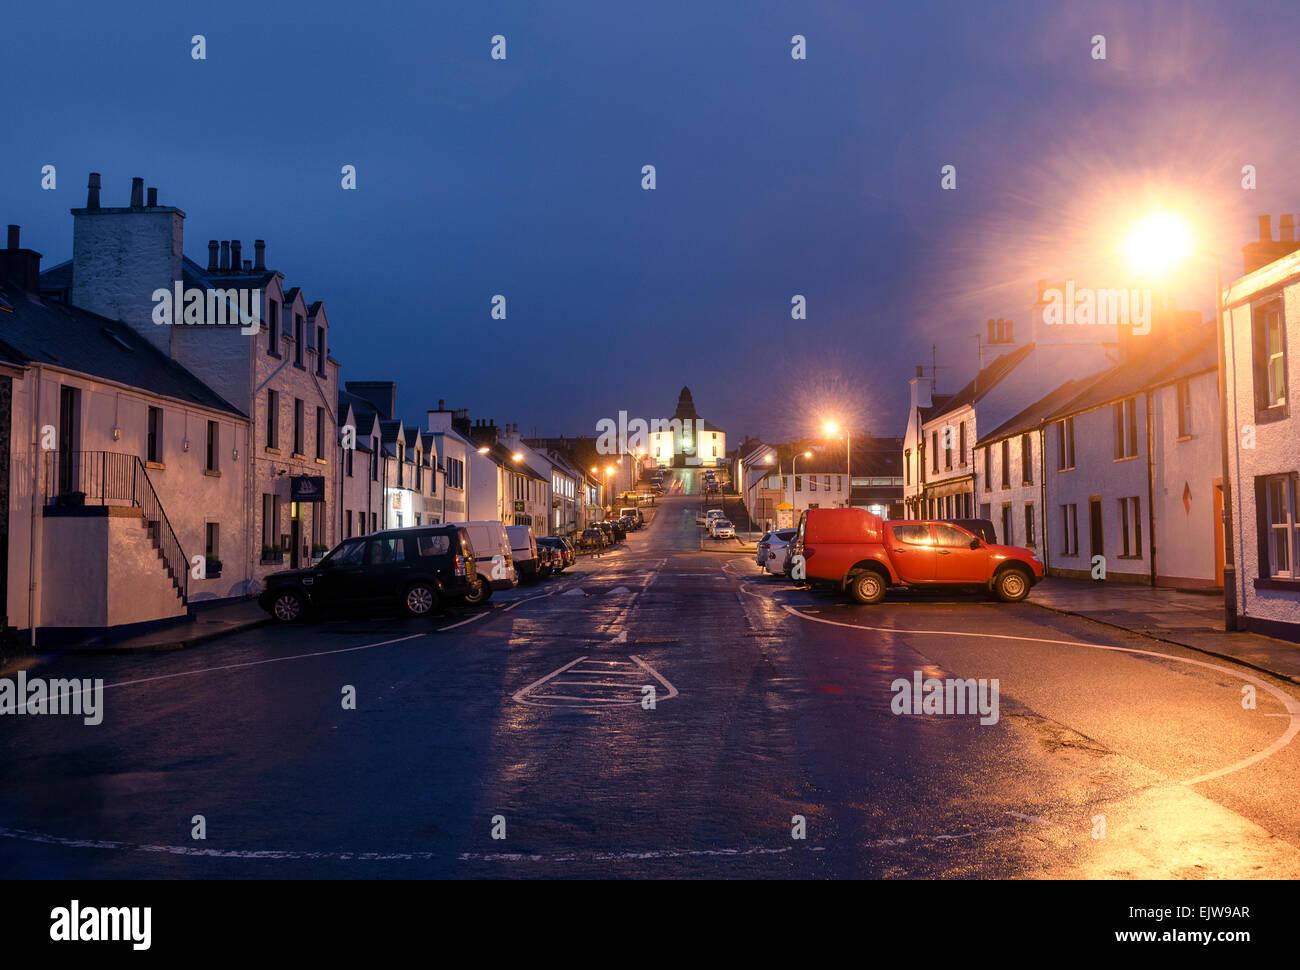 Las luces de la calle main street bowmore atardecer Imagen De Stock